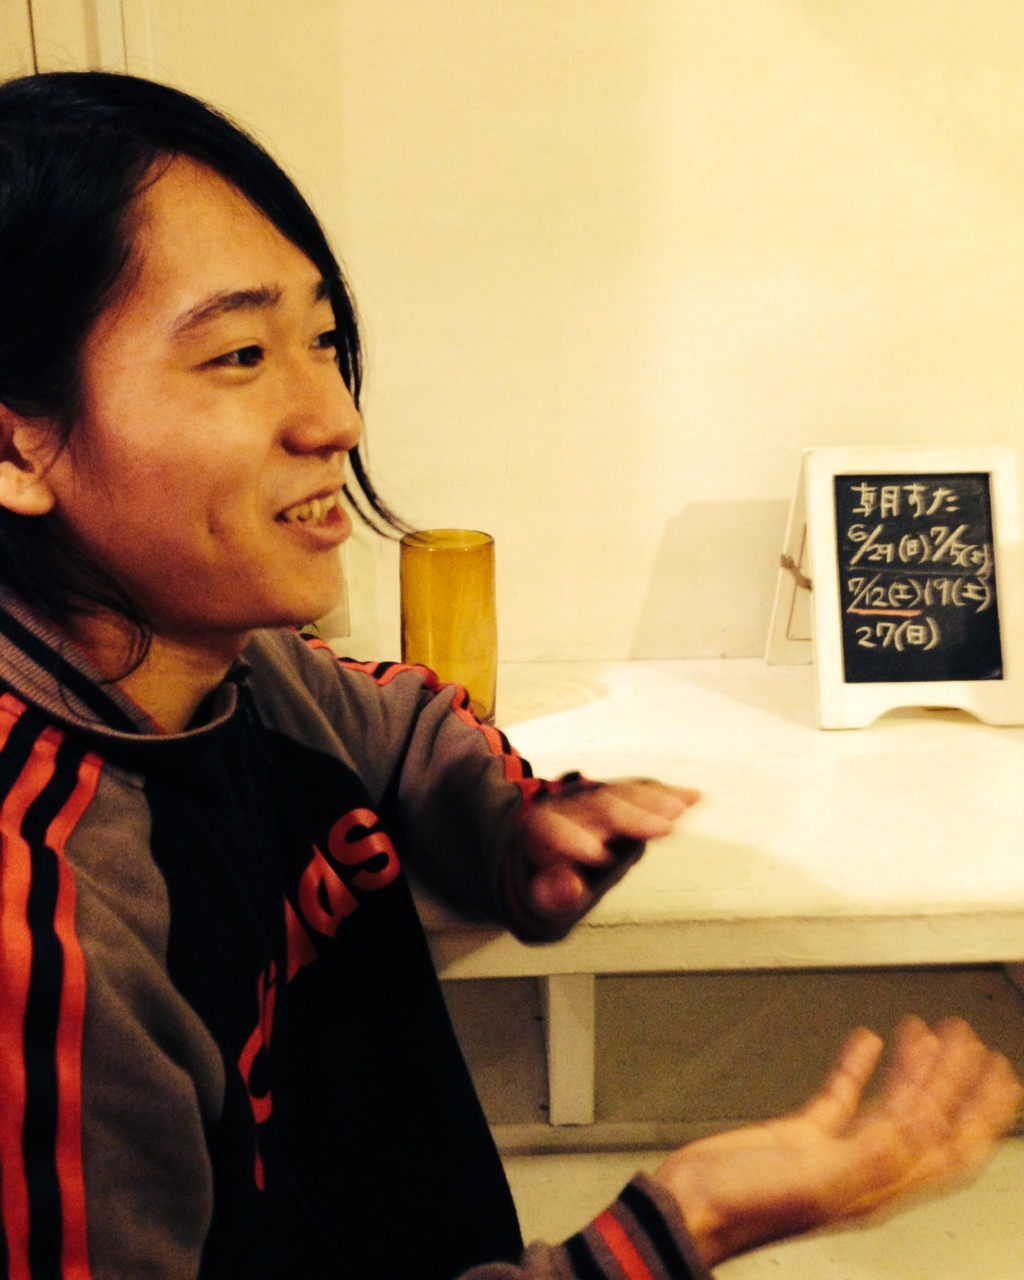 kiseki通信!!COMPANYインタビュー/米澤一平_f0137346_14373926.jpg